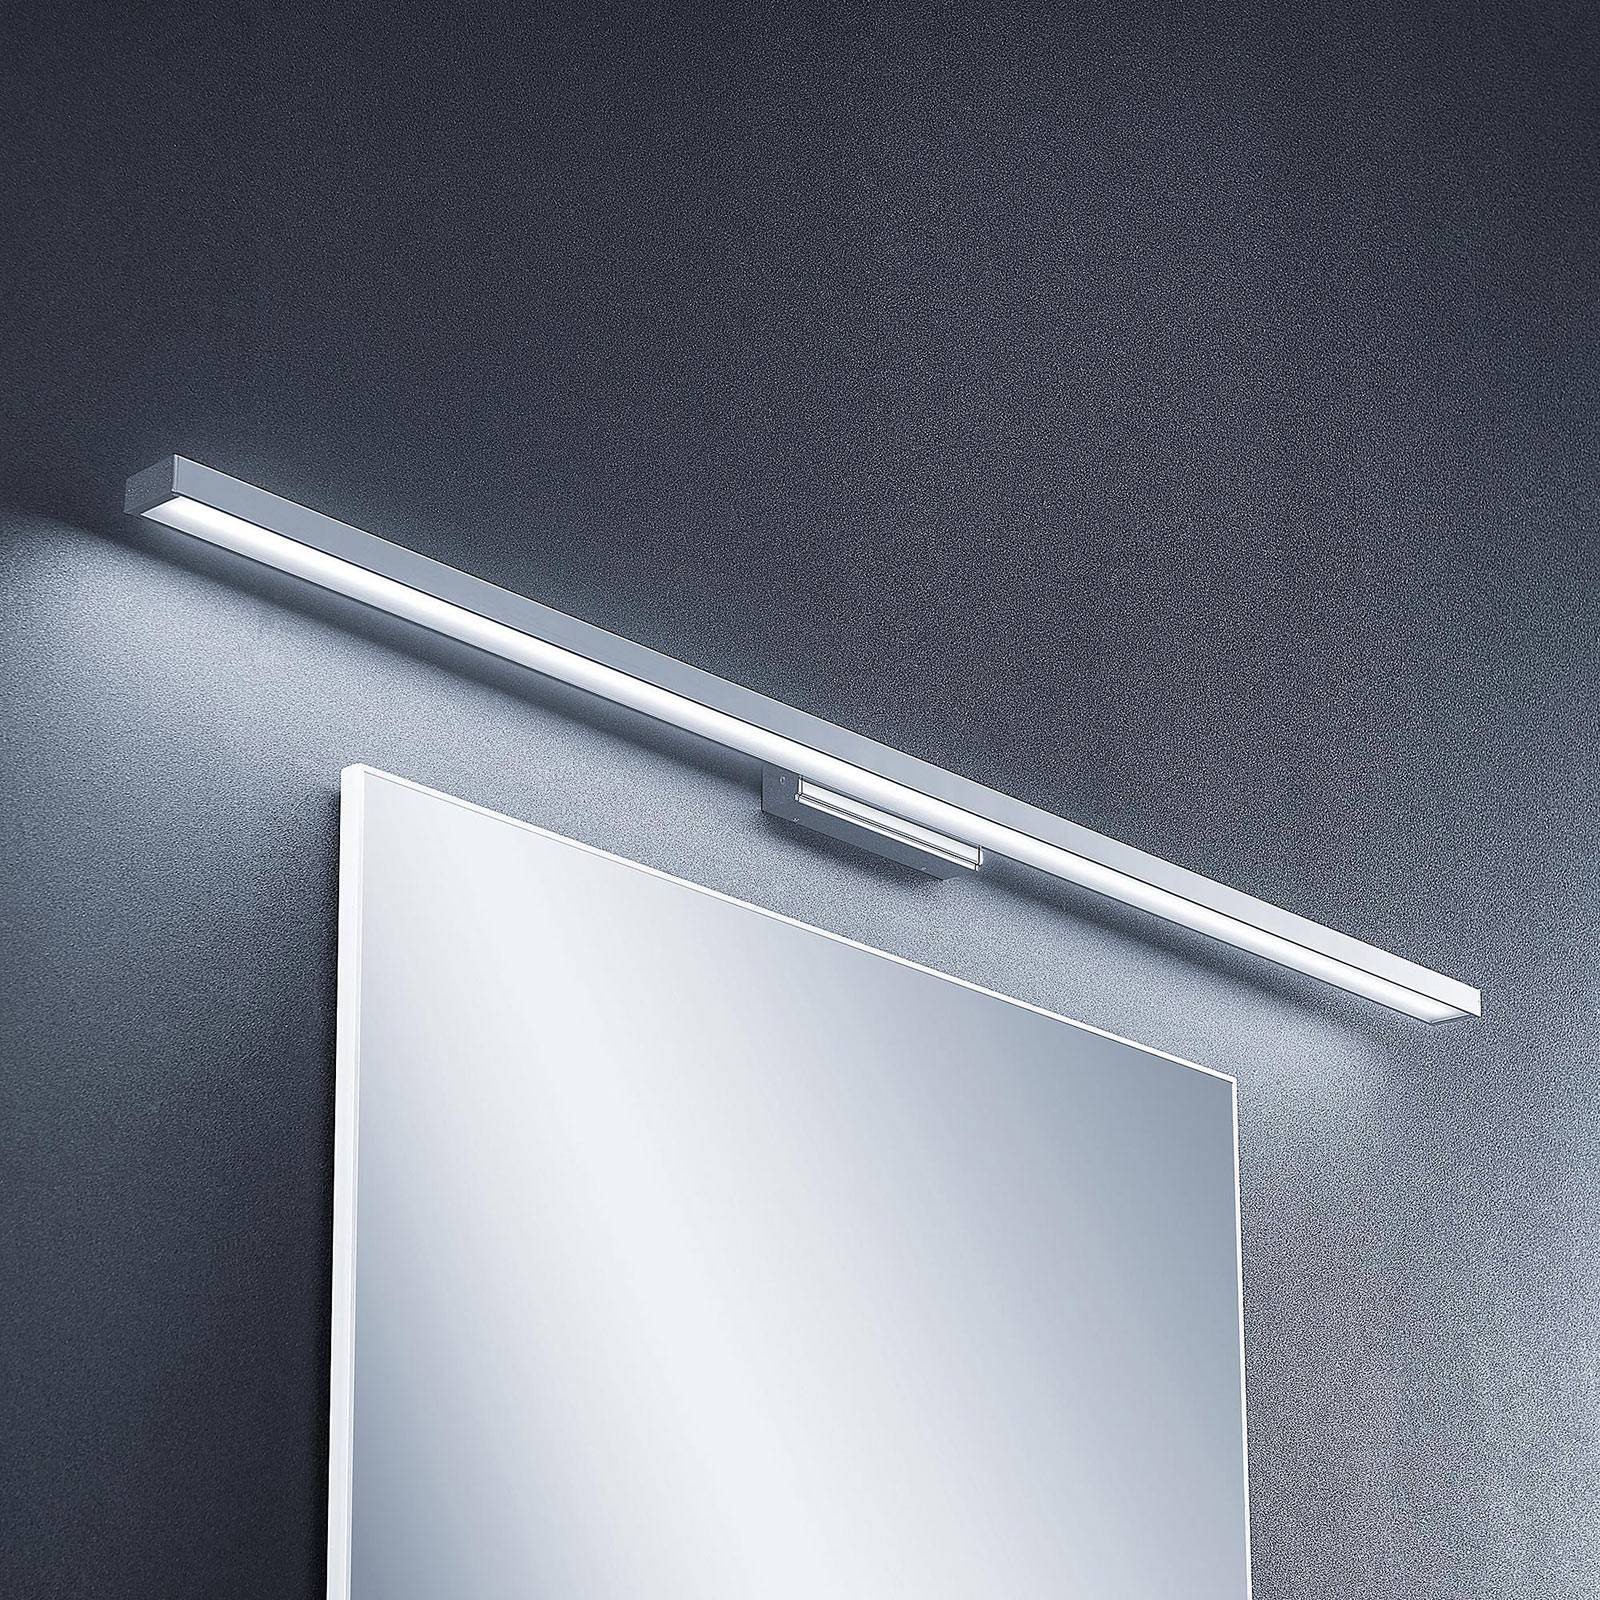 Lindby Alenia -kylpyhuoneen LED-peililamppu 120 cm